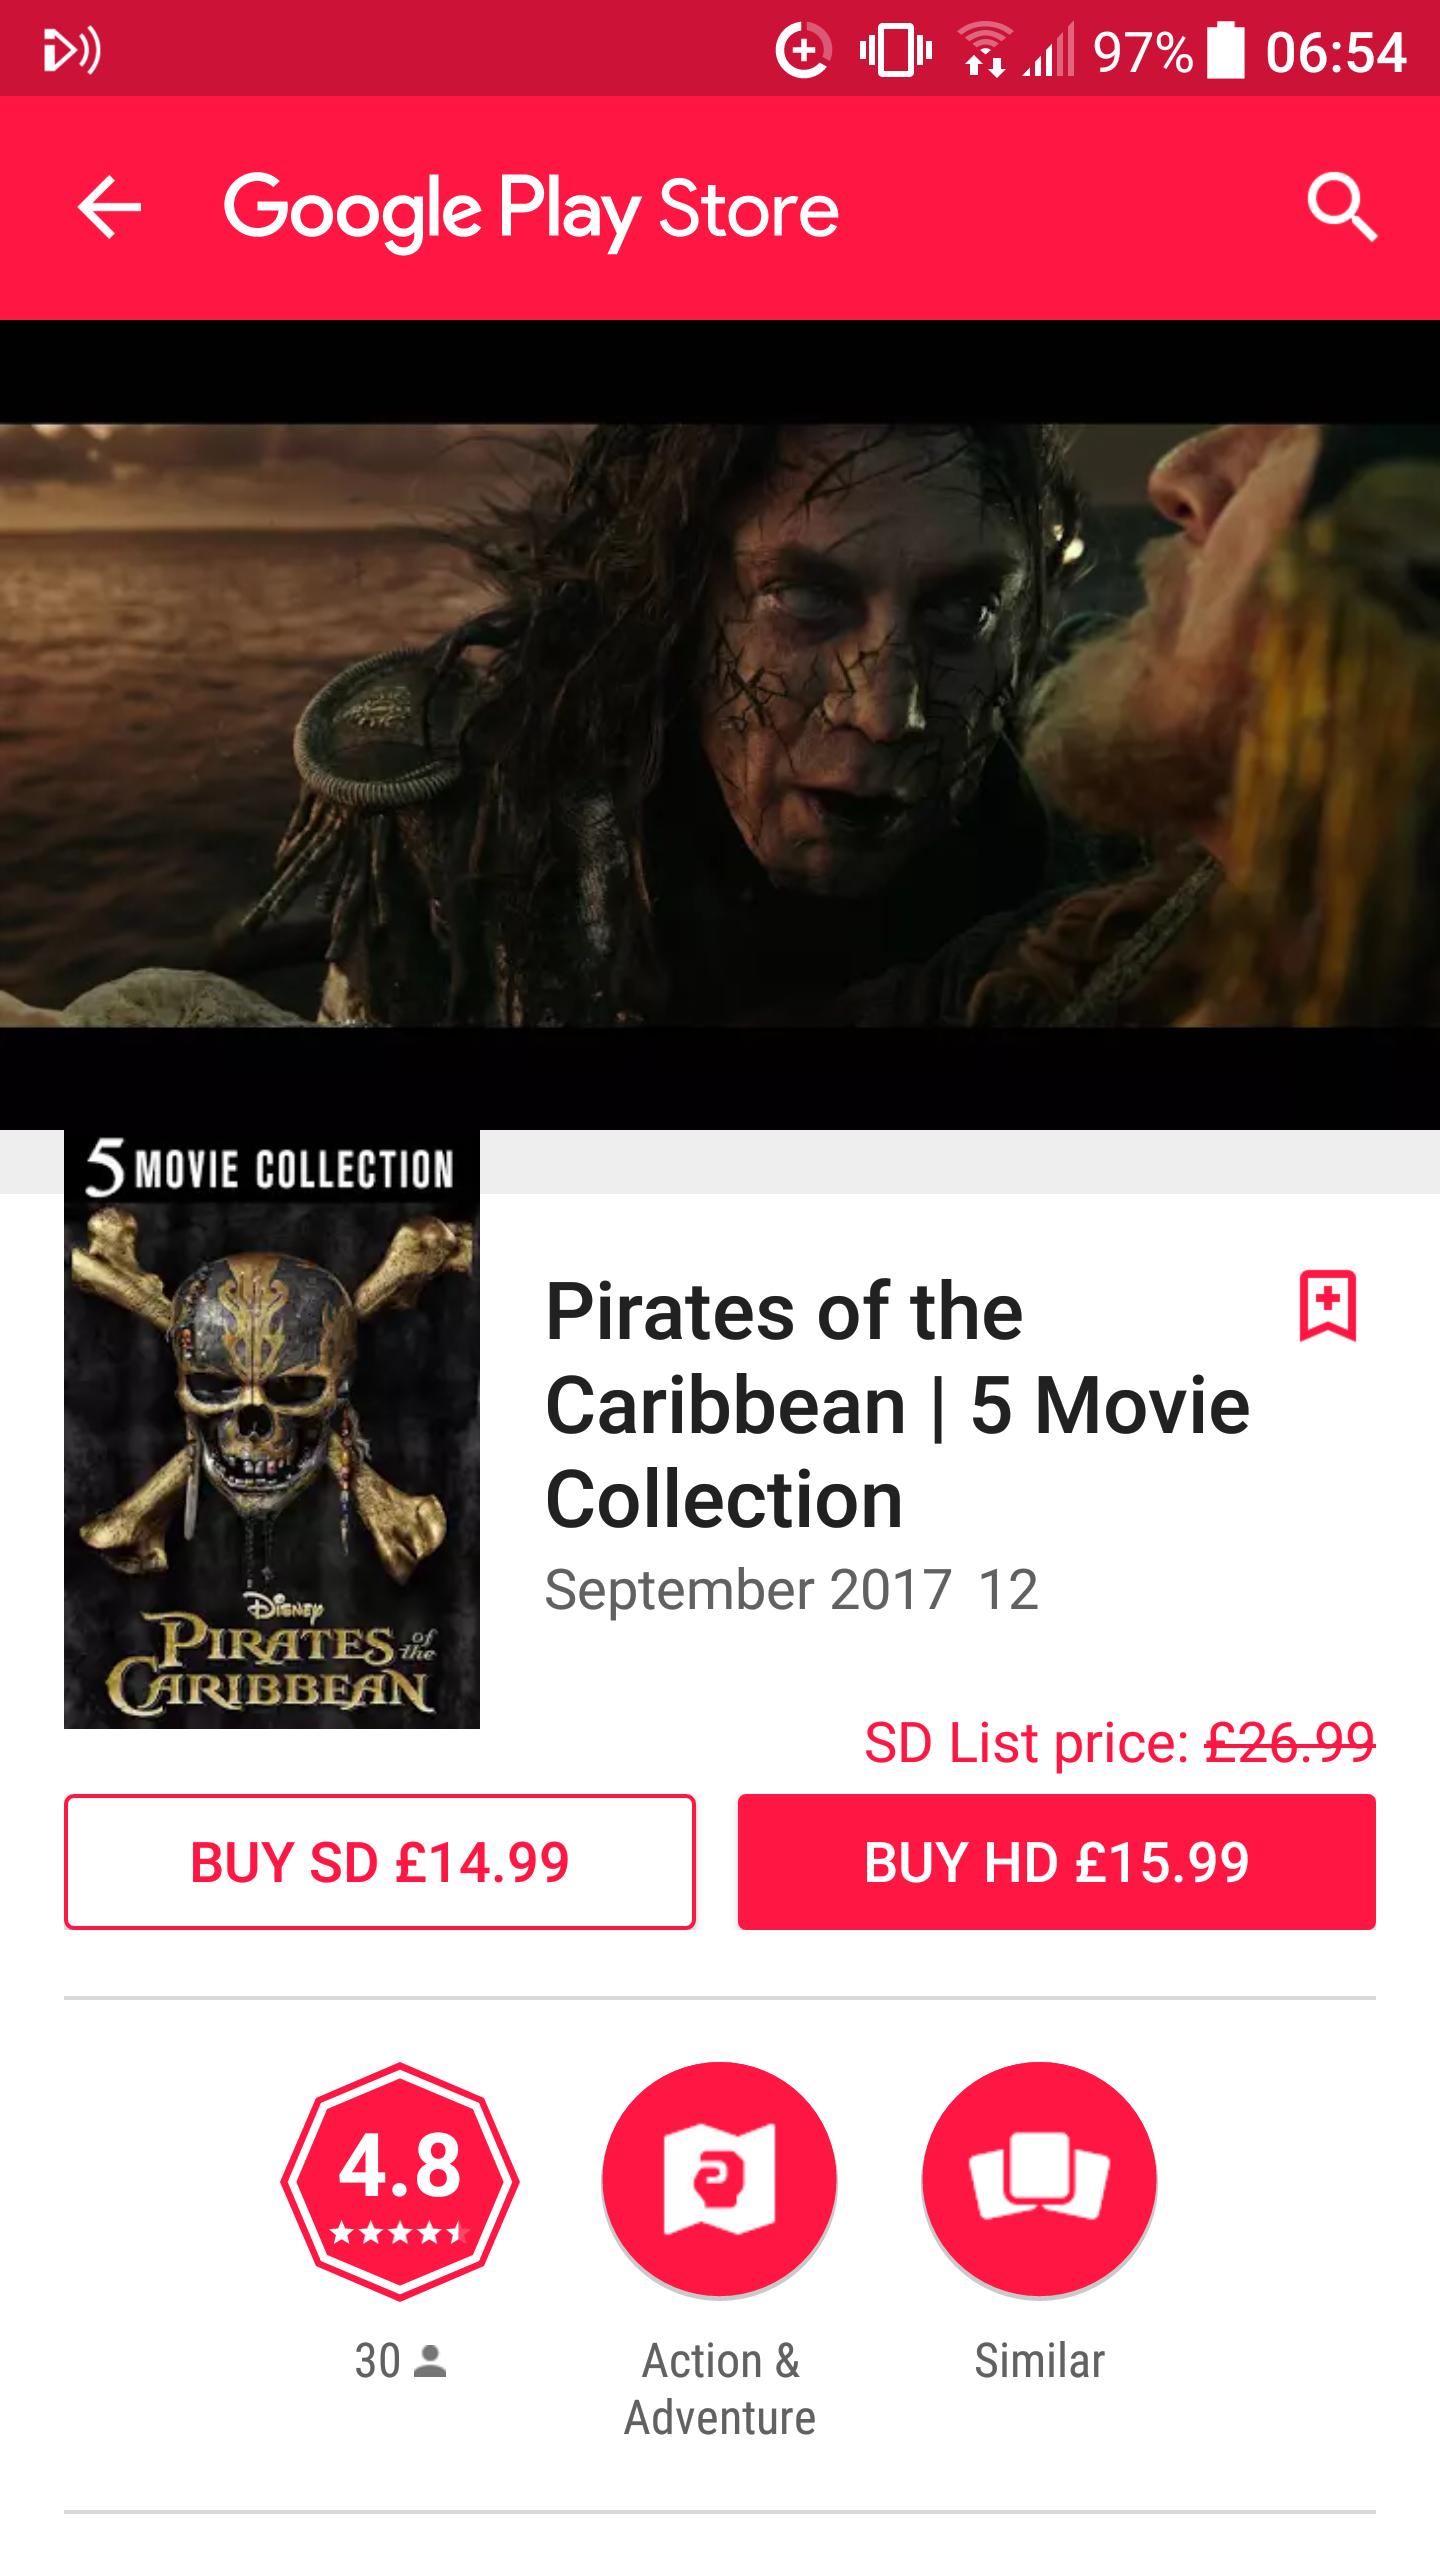 Pirates Of The Caribbean 5 movie boxset HD £15.99 on Google Play